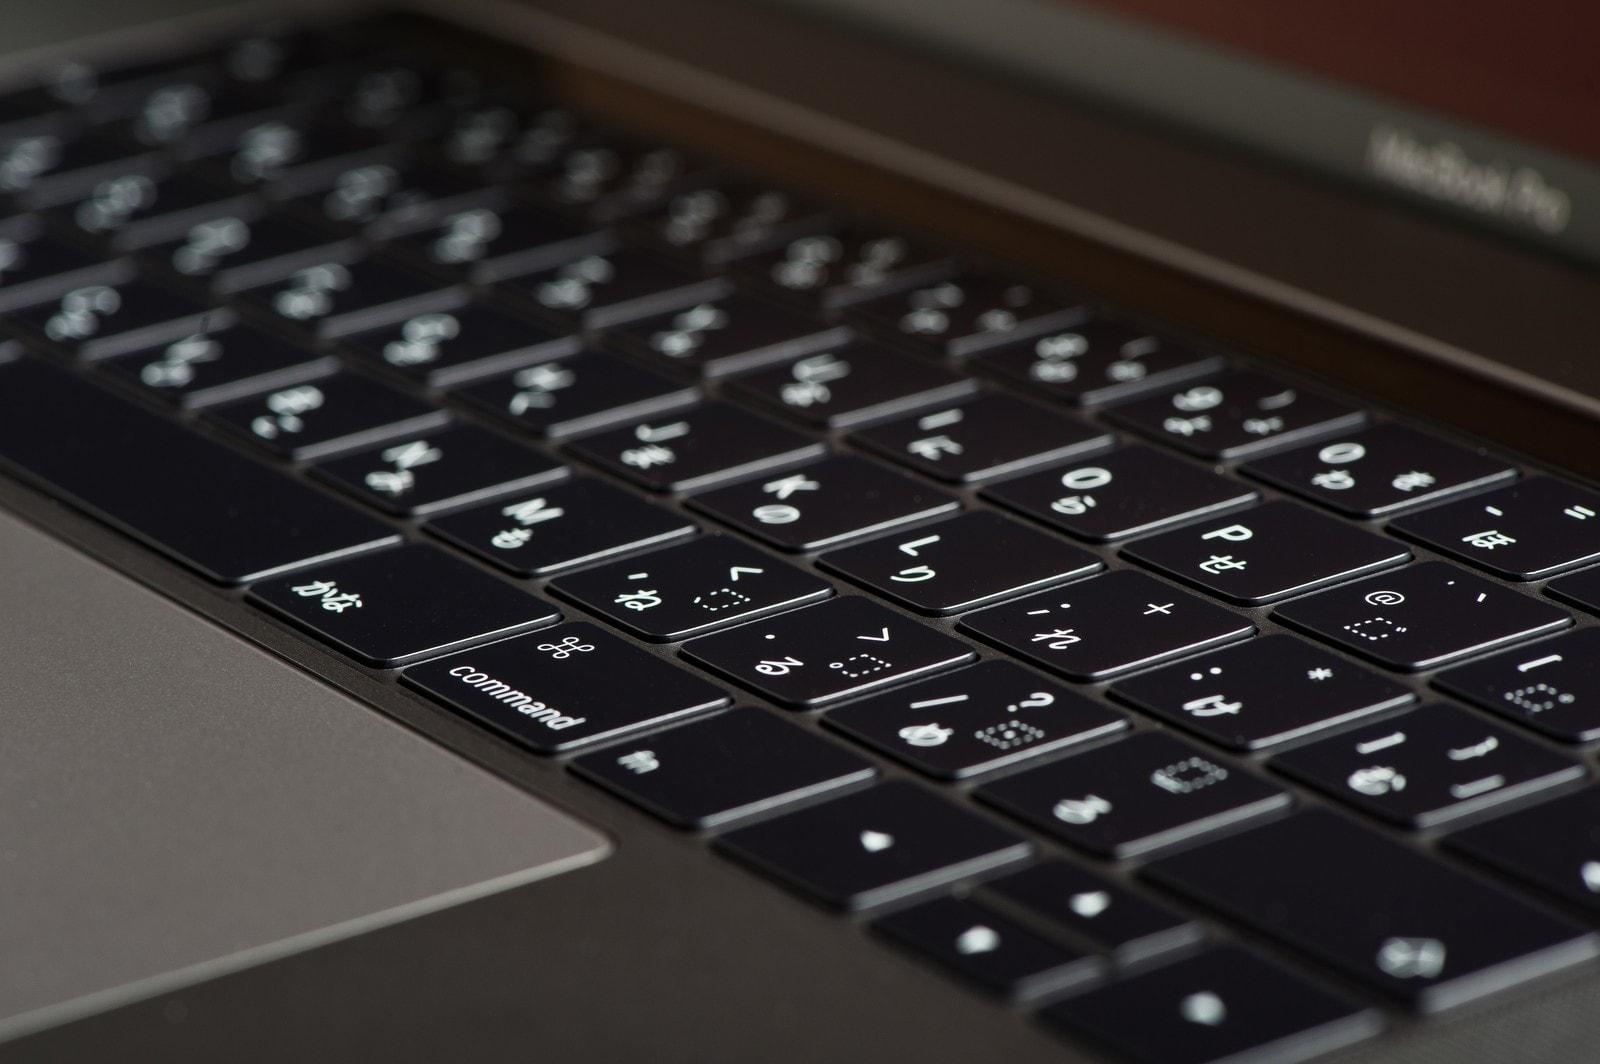 MacBook Proのバタフライキーボードは不具合が多発しているという噂